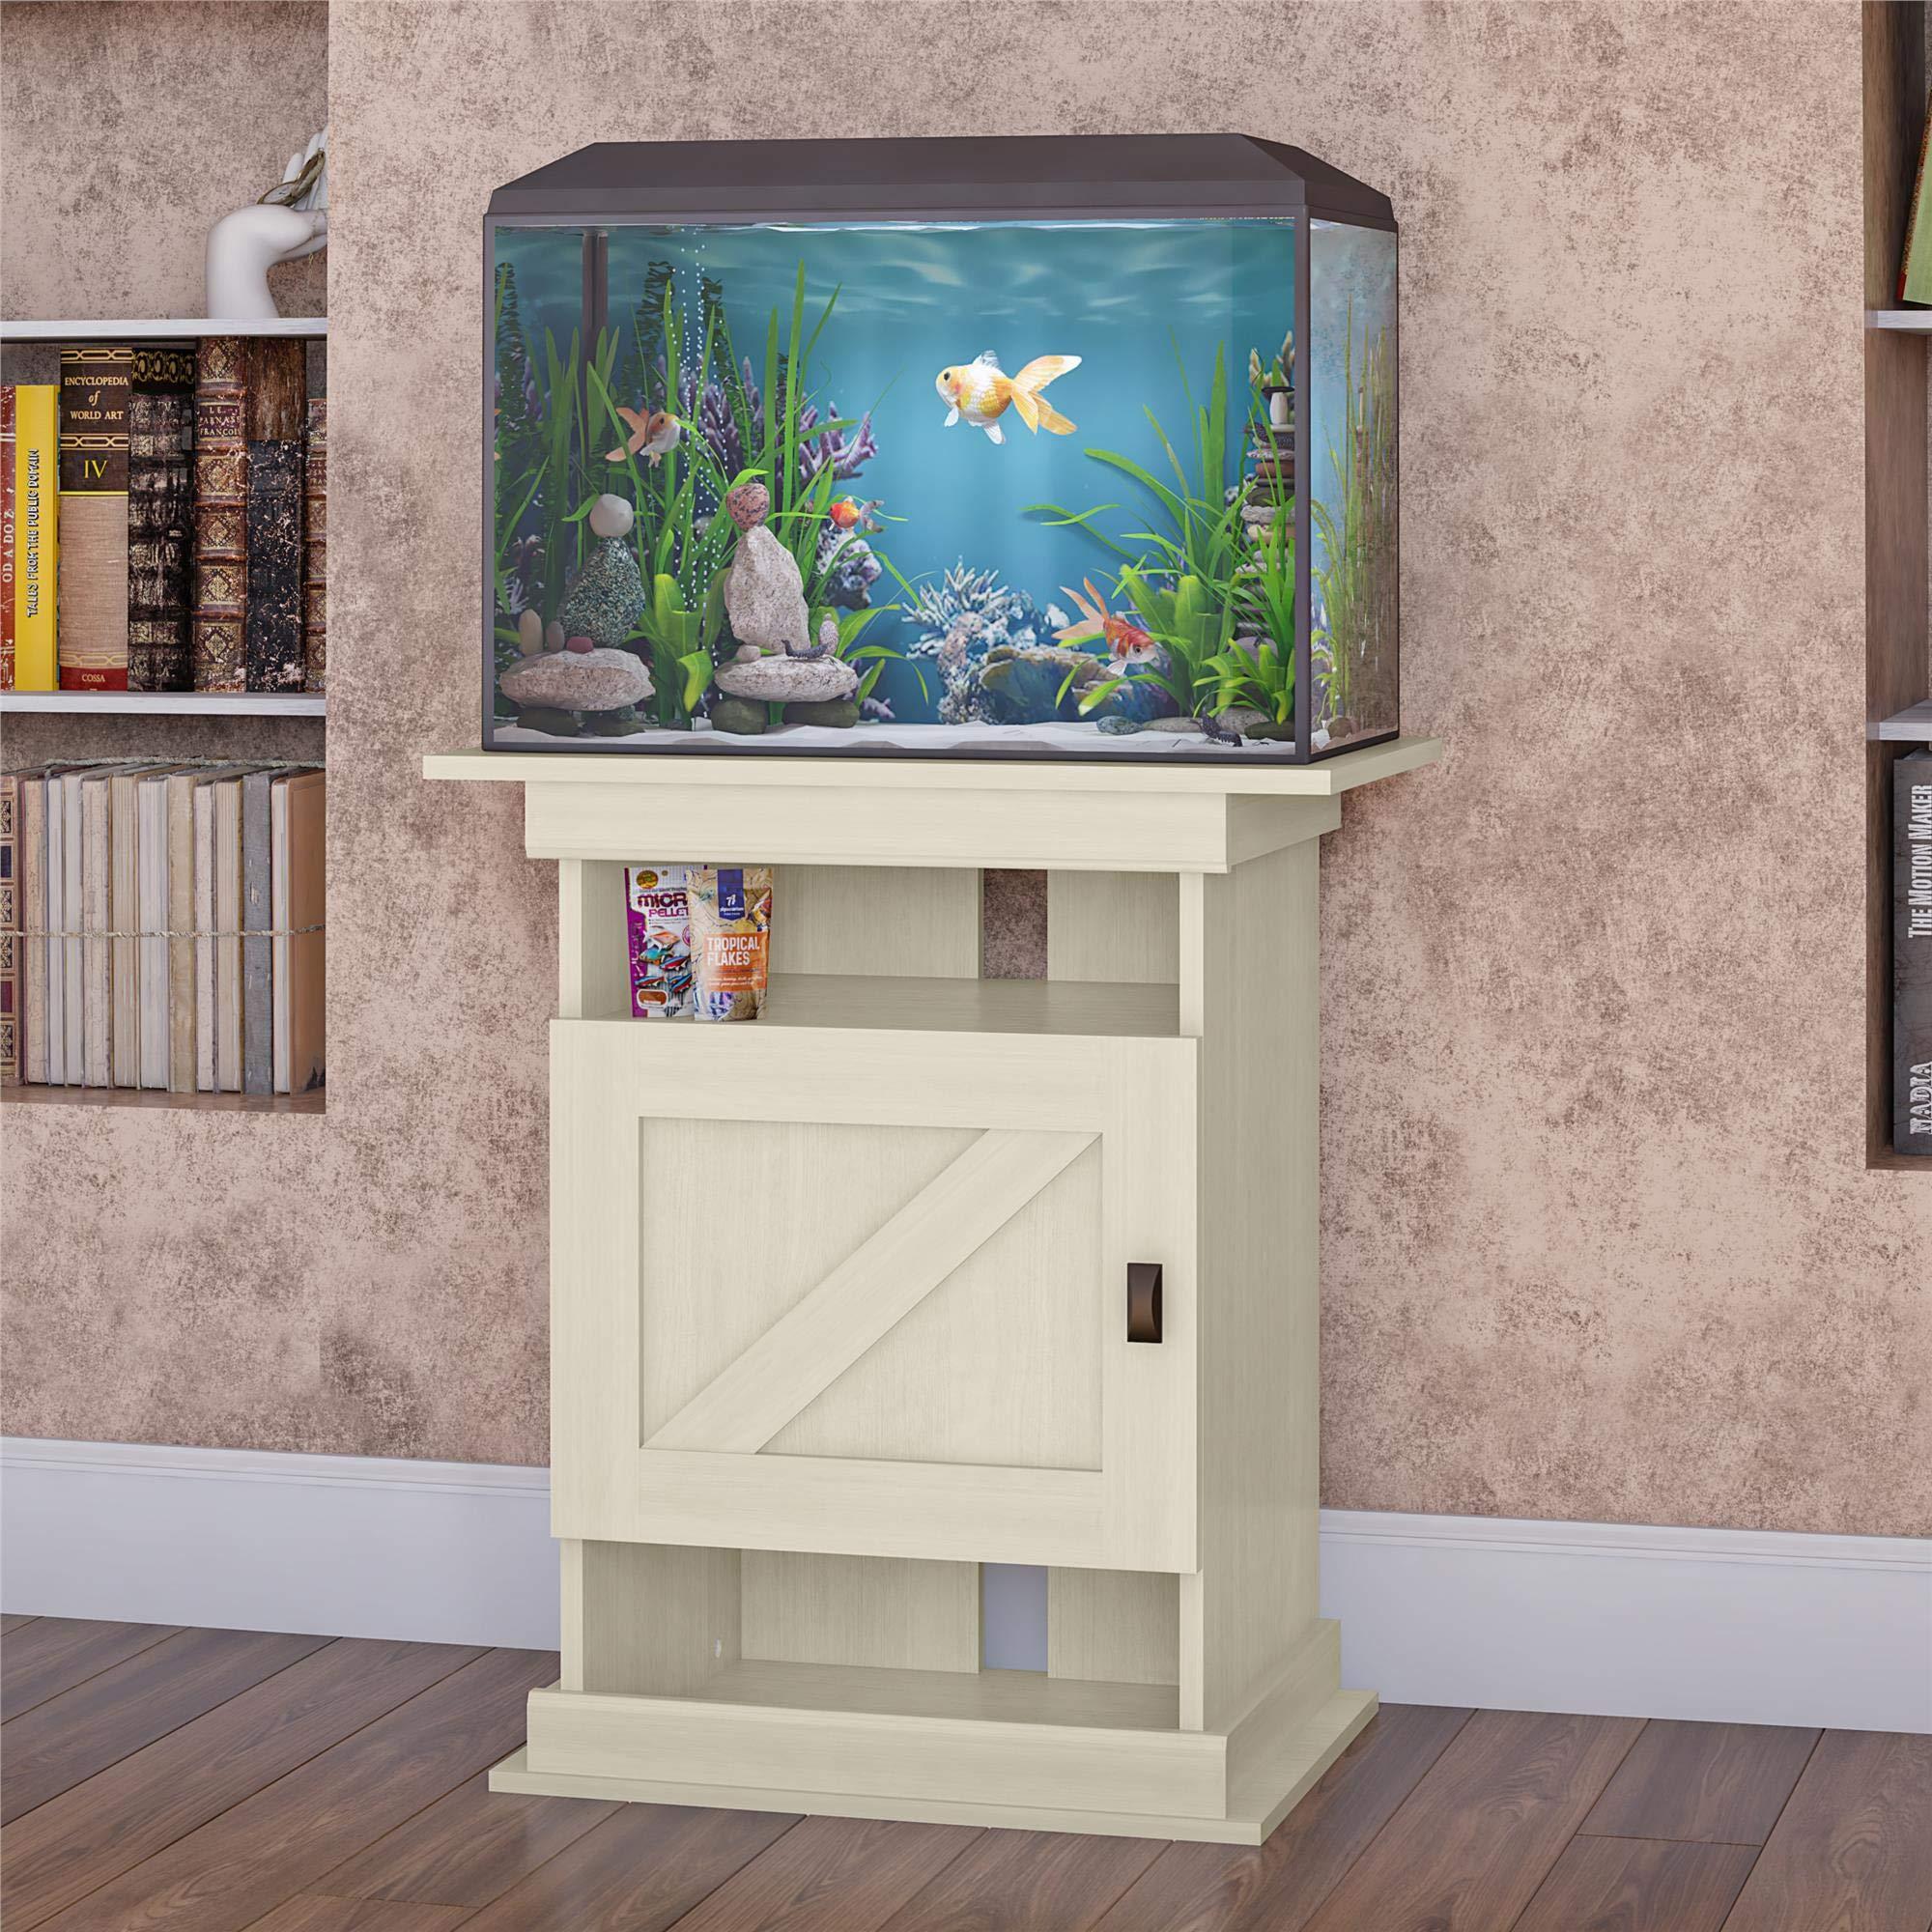 Ollie & Hutch Farmington Flipper, Ivory Oak aquarium stand